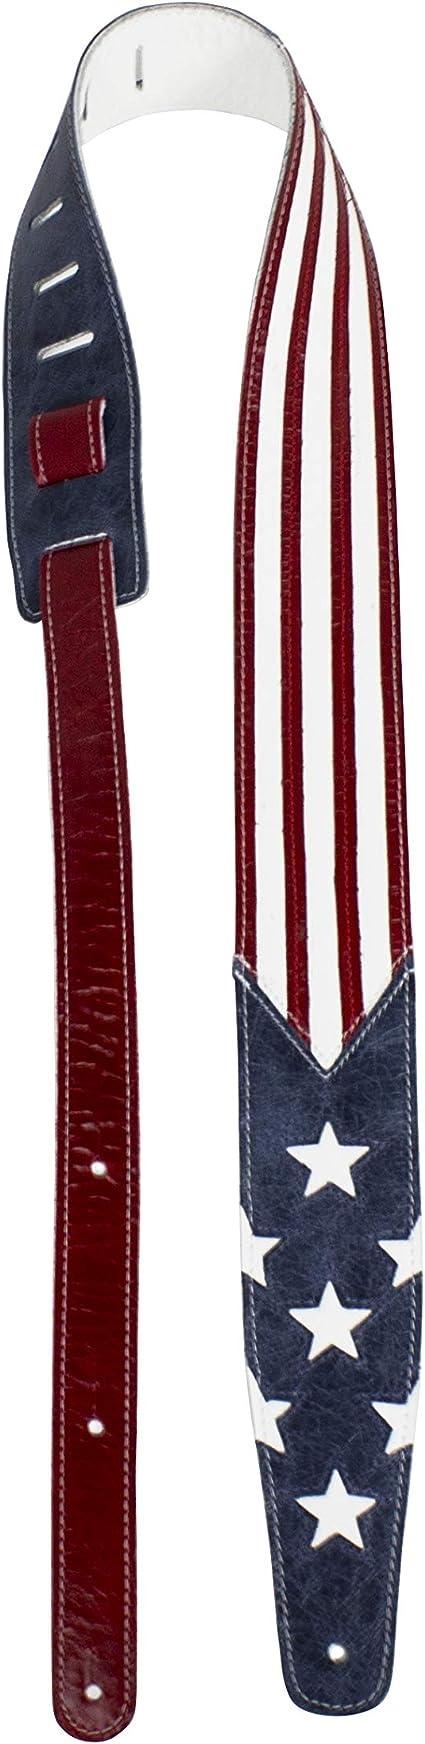 Union Jack Perri Webbing Strap